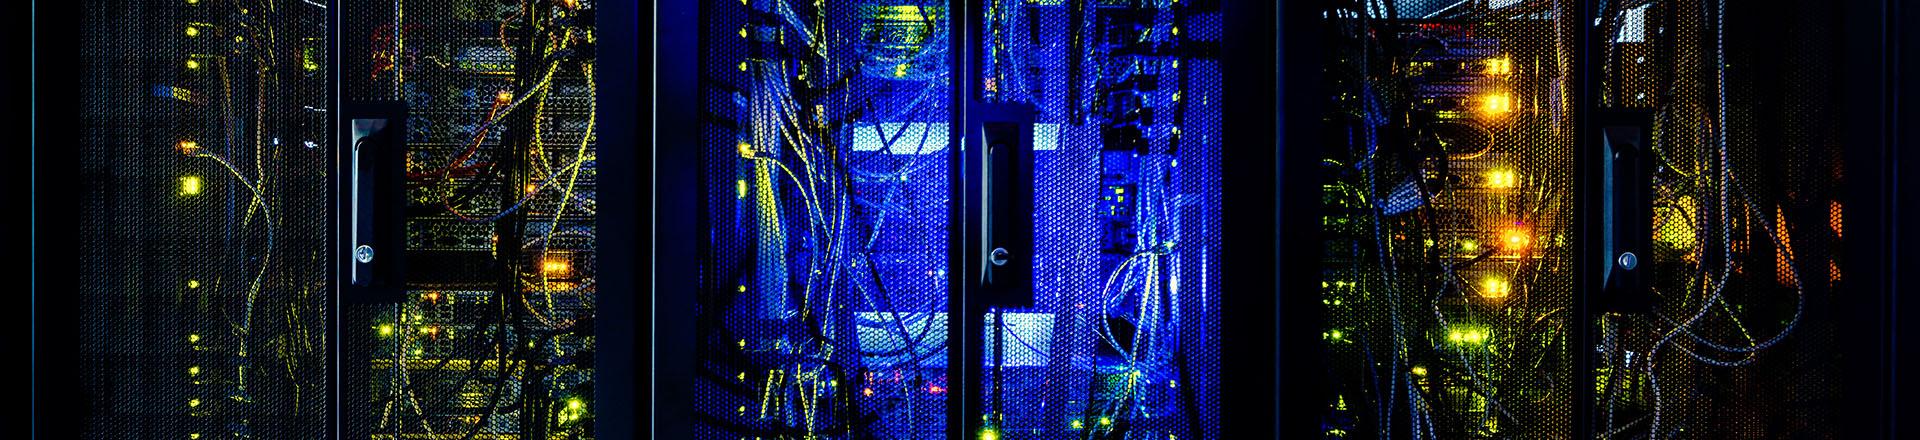 Канада прокси-серверы - Fresh Proxy List | free-proxy cz